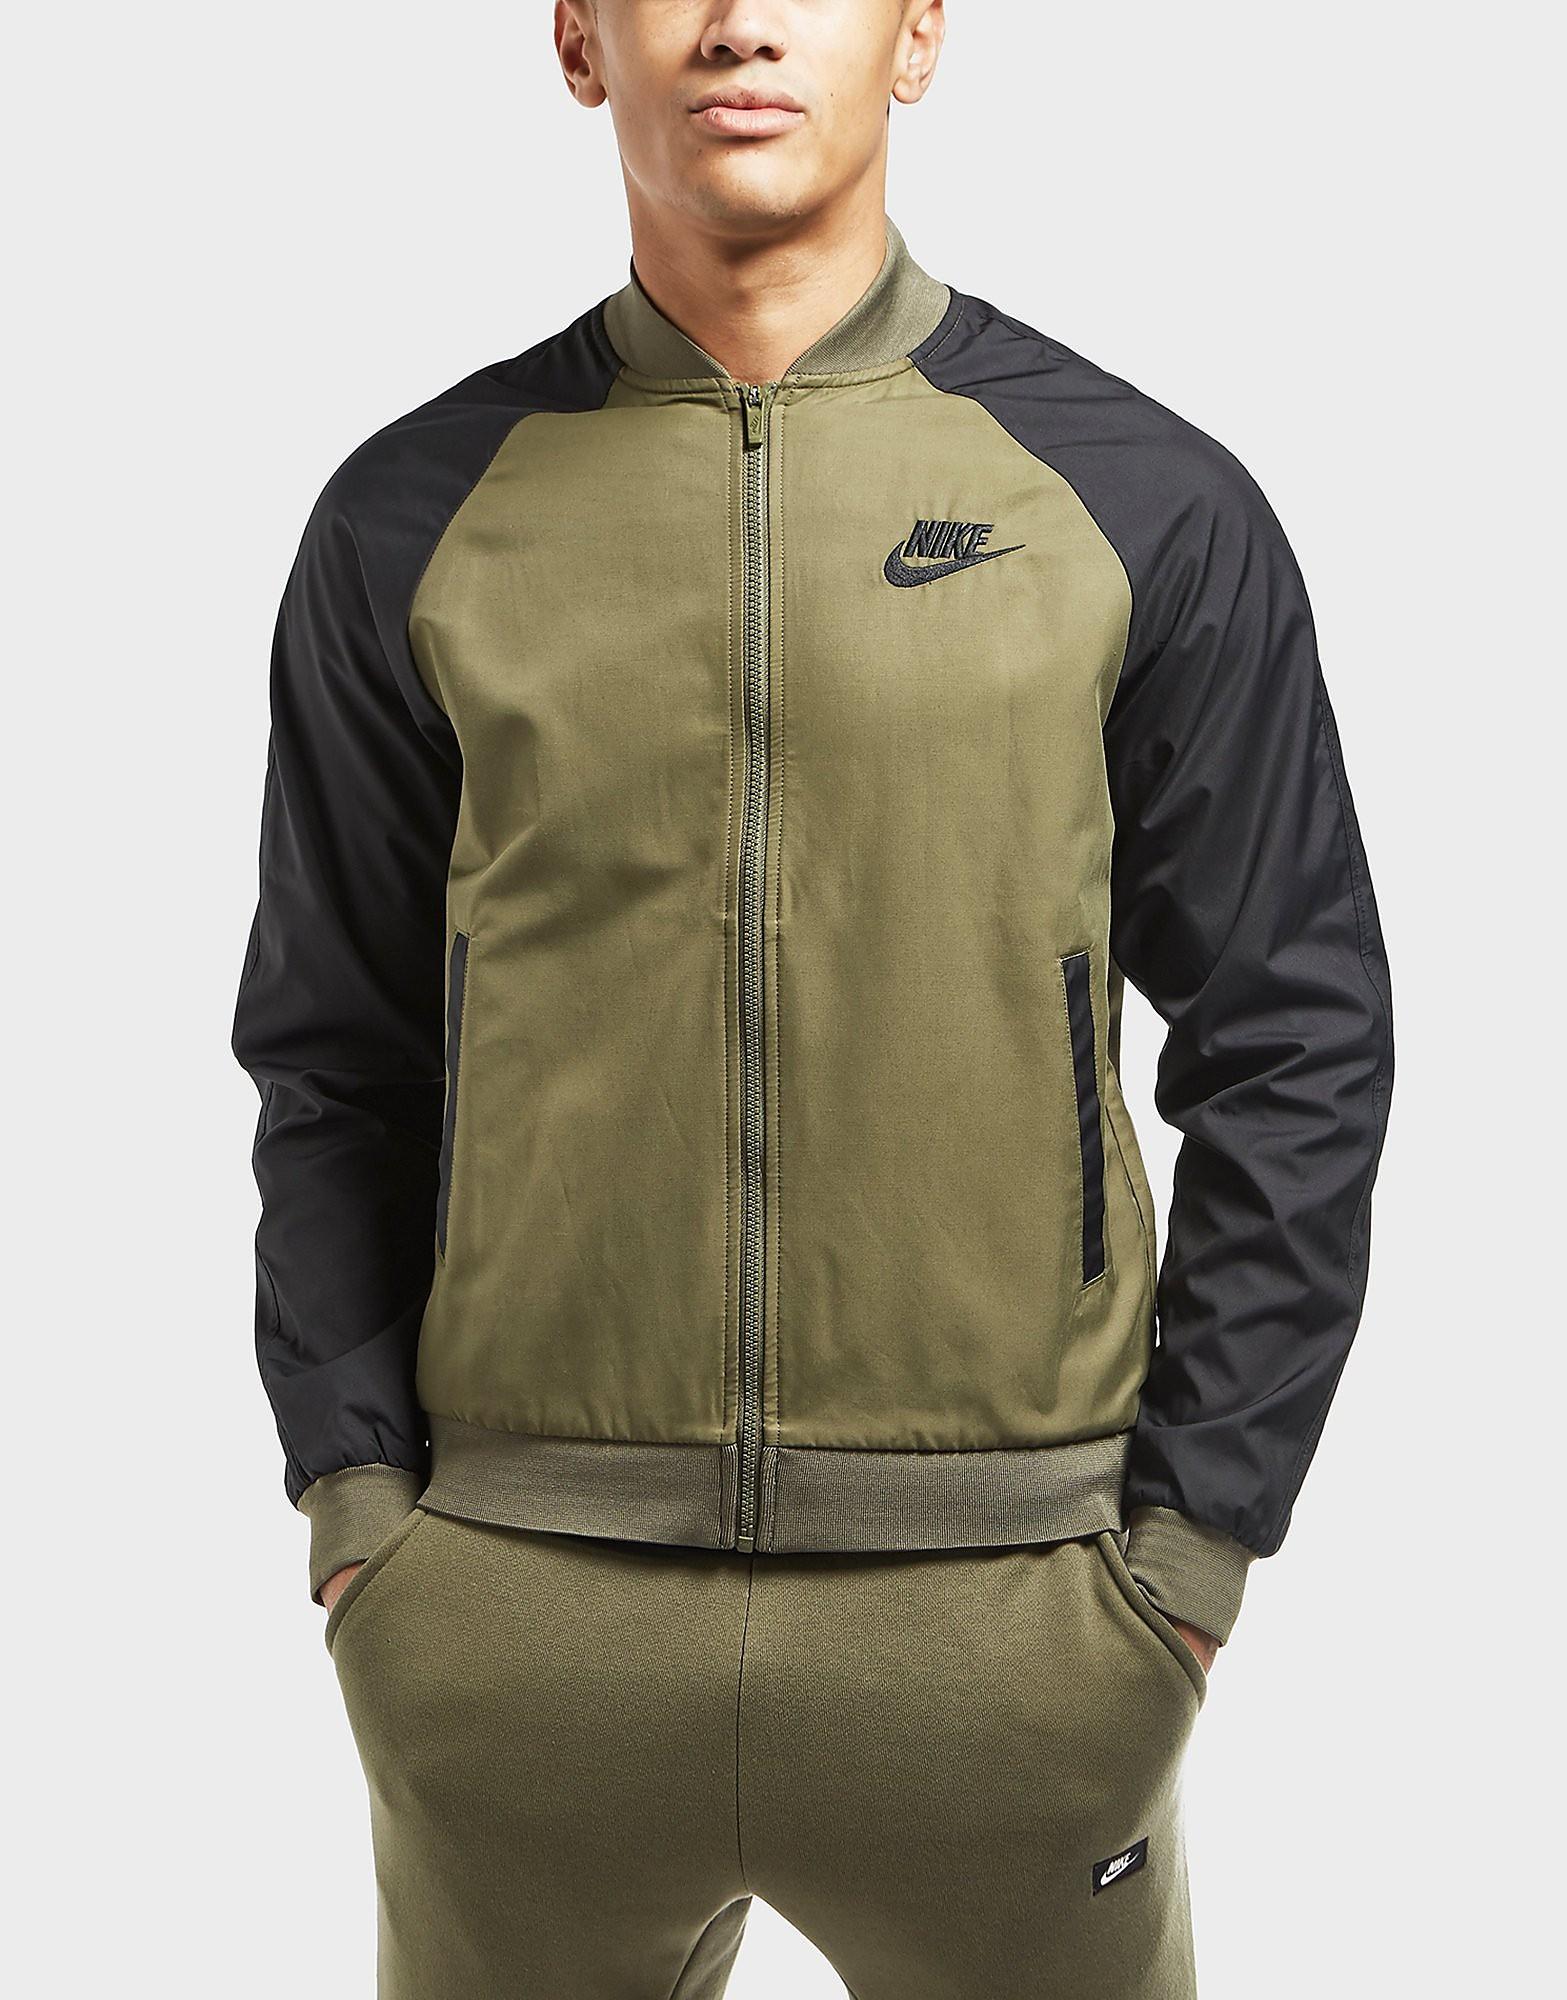 Nike Woven Lightweight Bomber Jacket